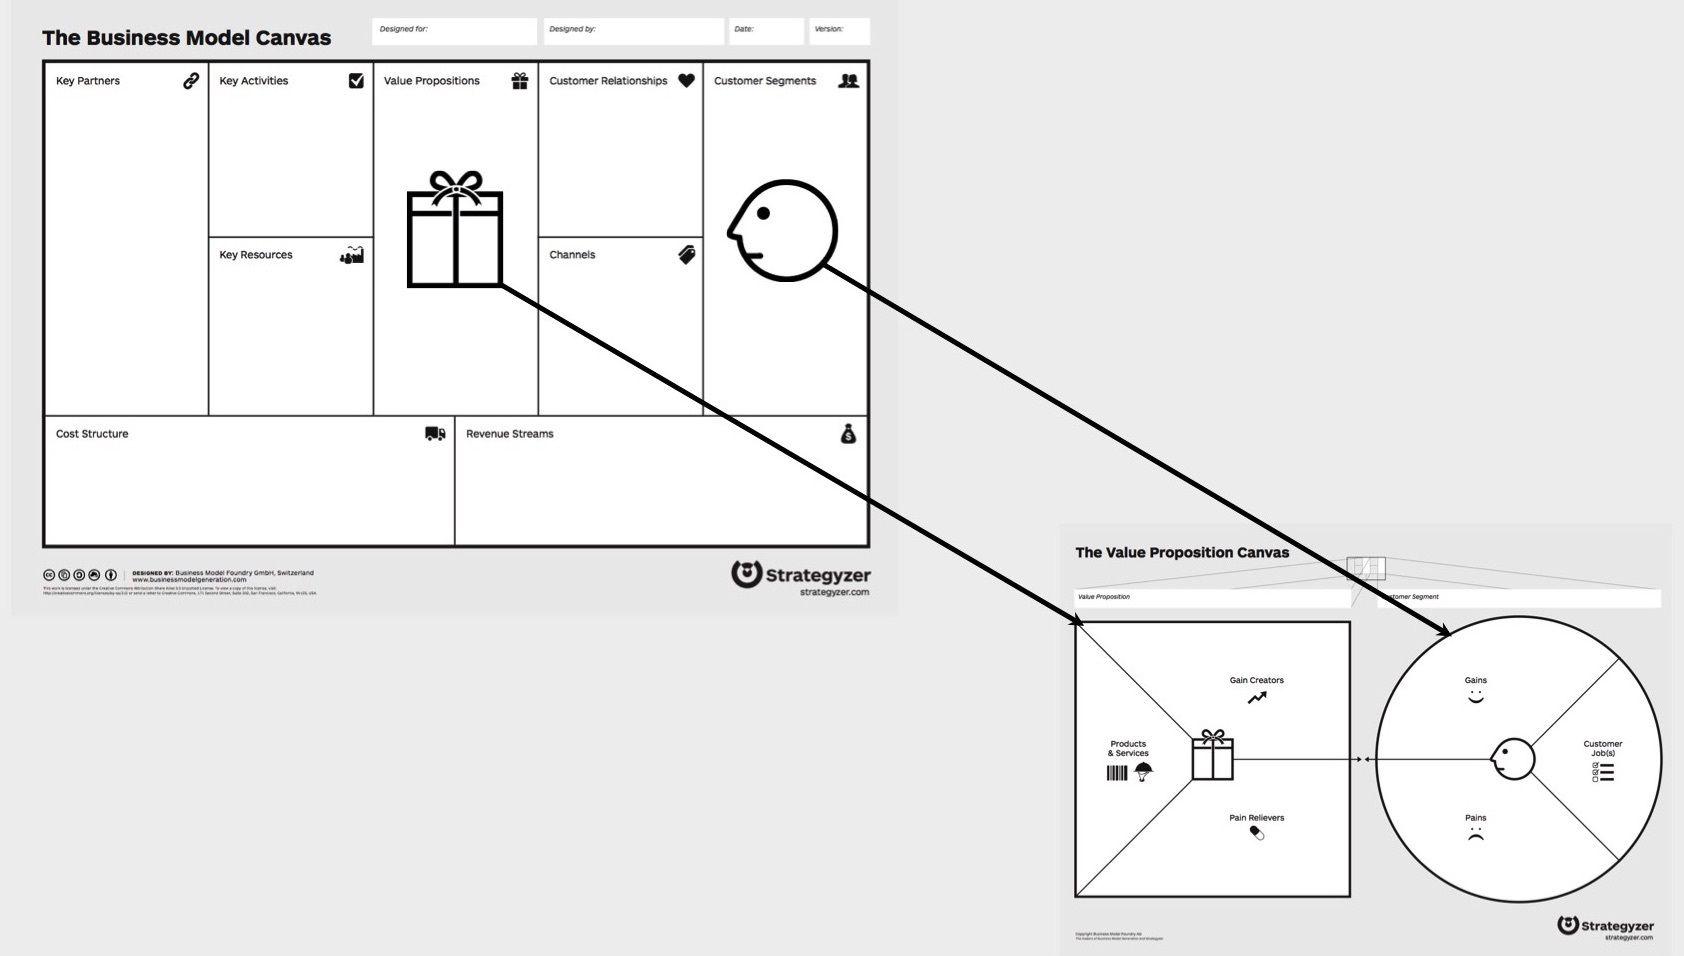 Value prop zoom bus model Business canvas, Planification